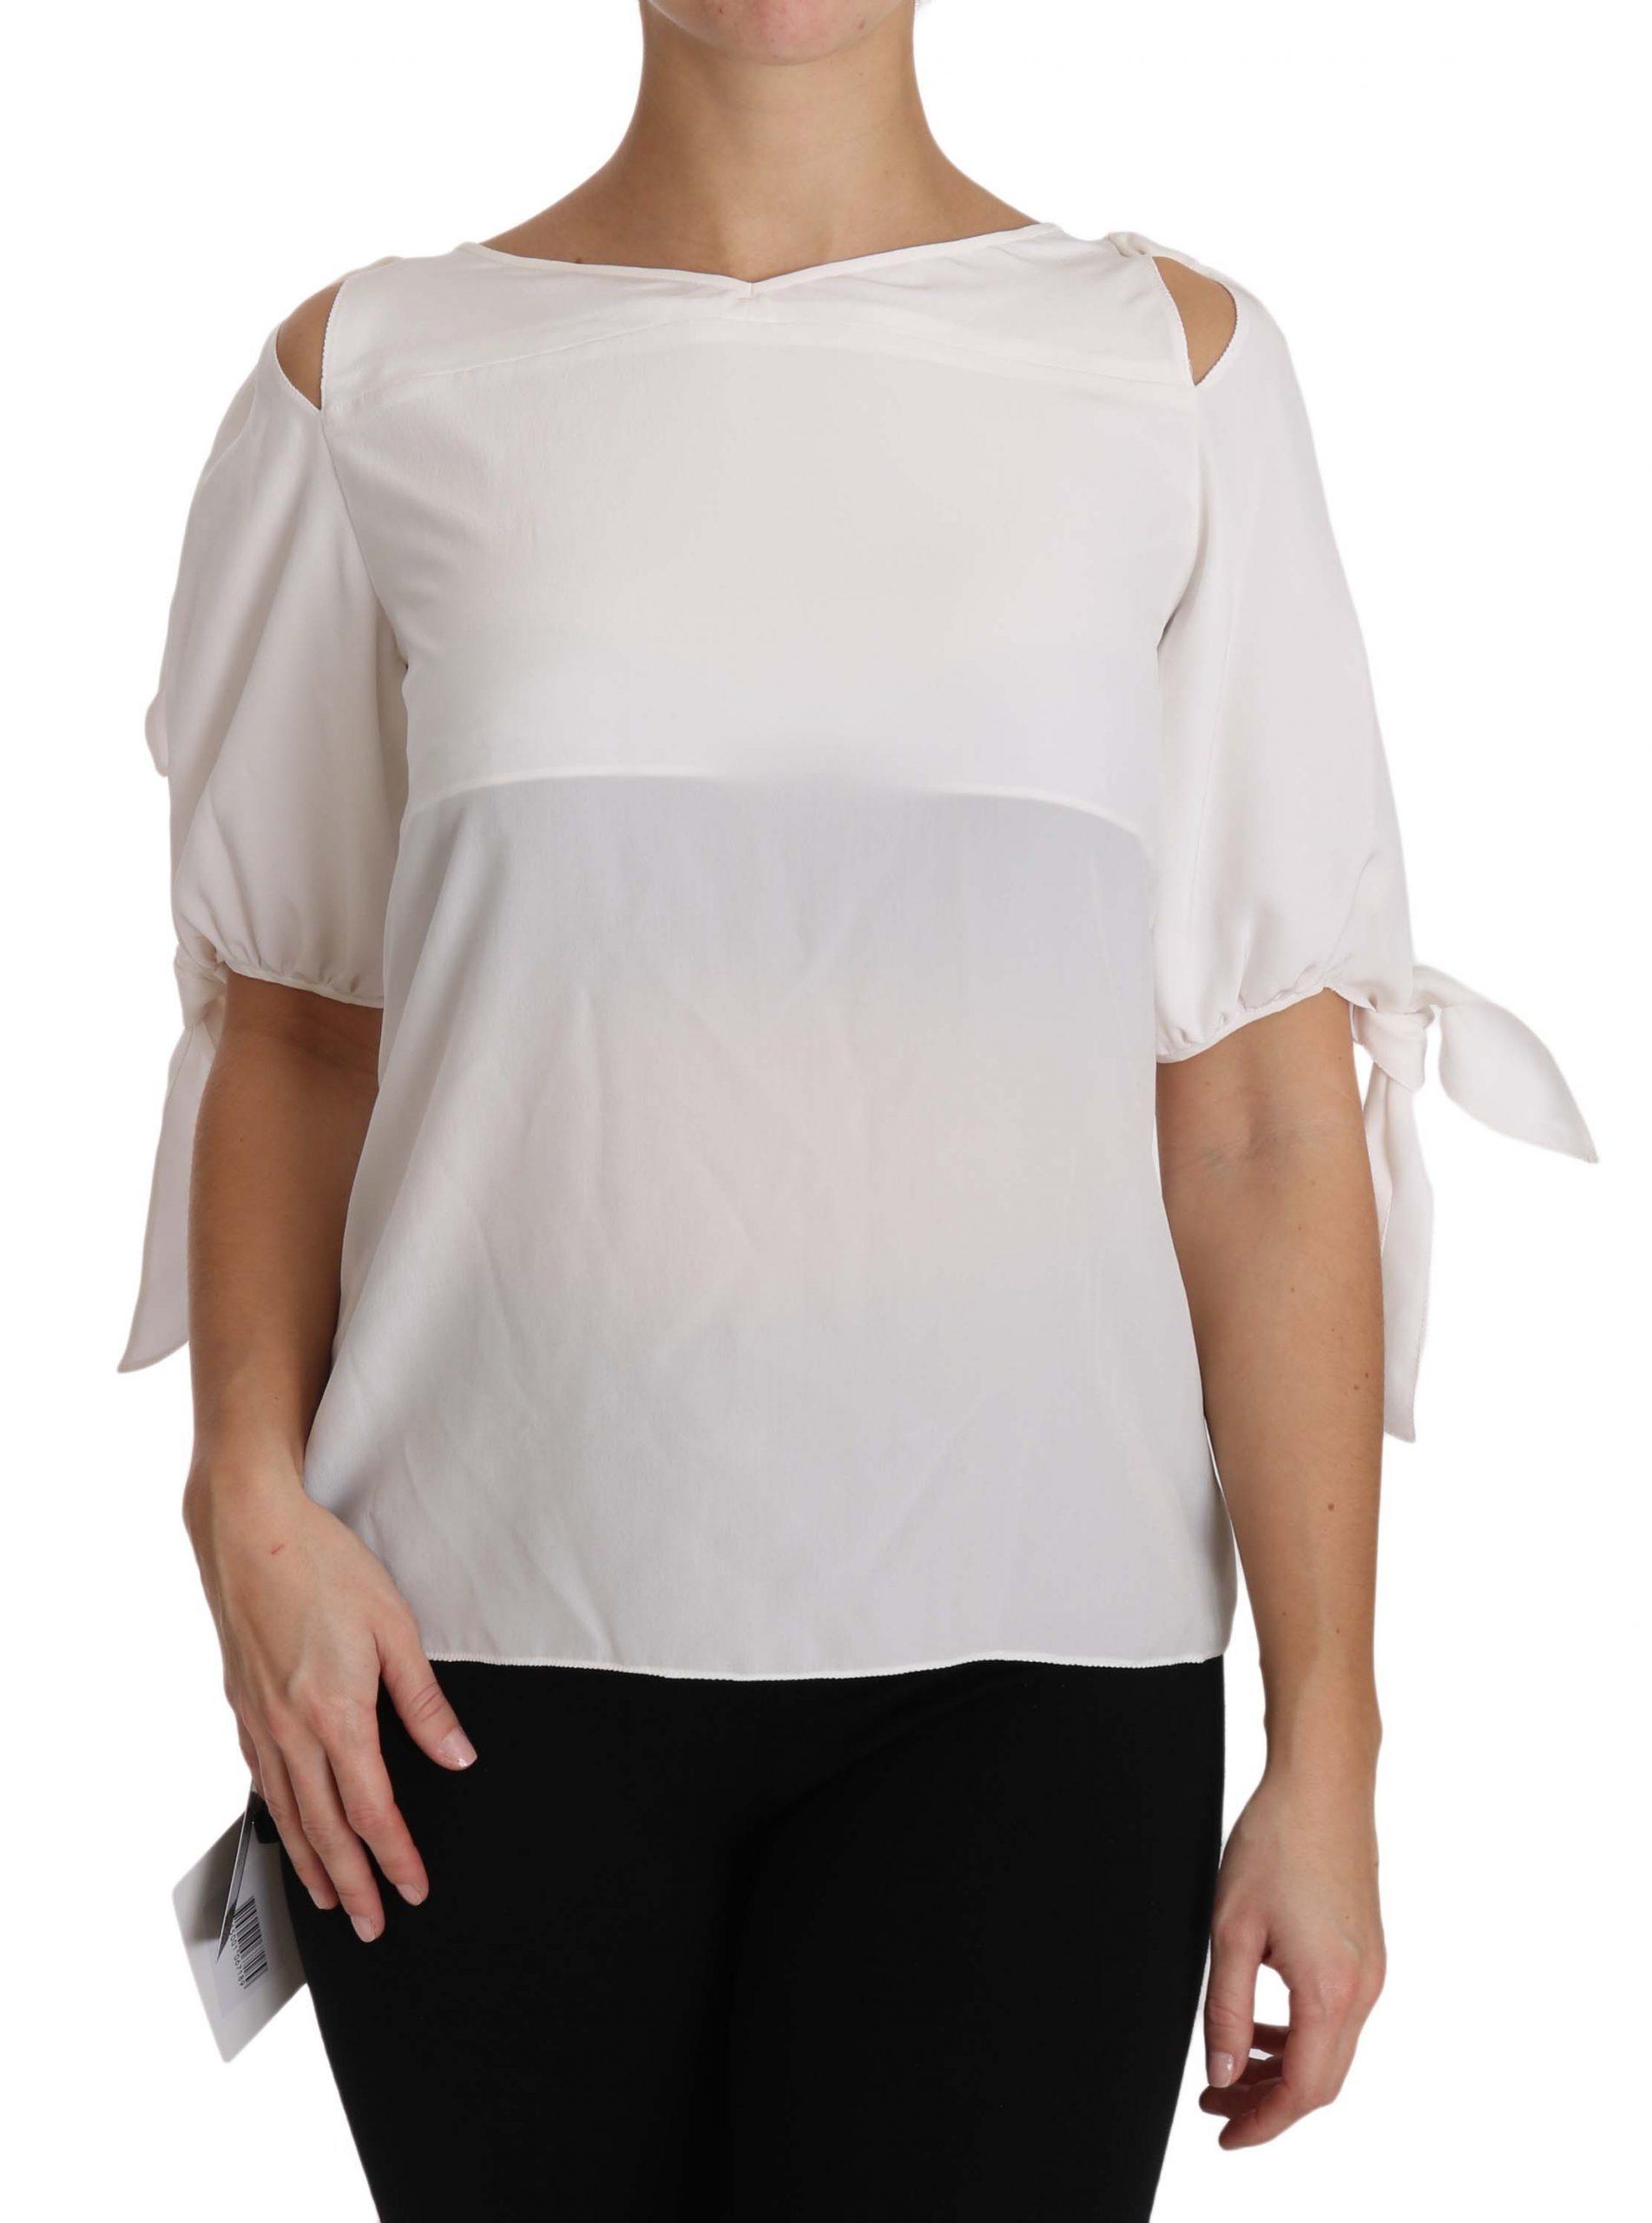 Dolce & Gabbana Women's Silk Off Shoulder Tops White TSH2957 - IT40 | M